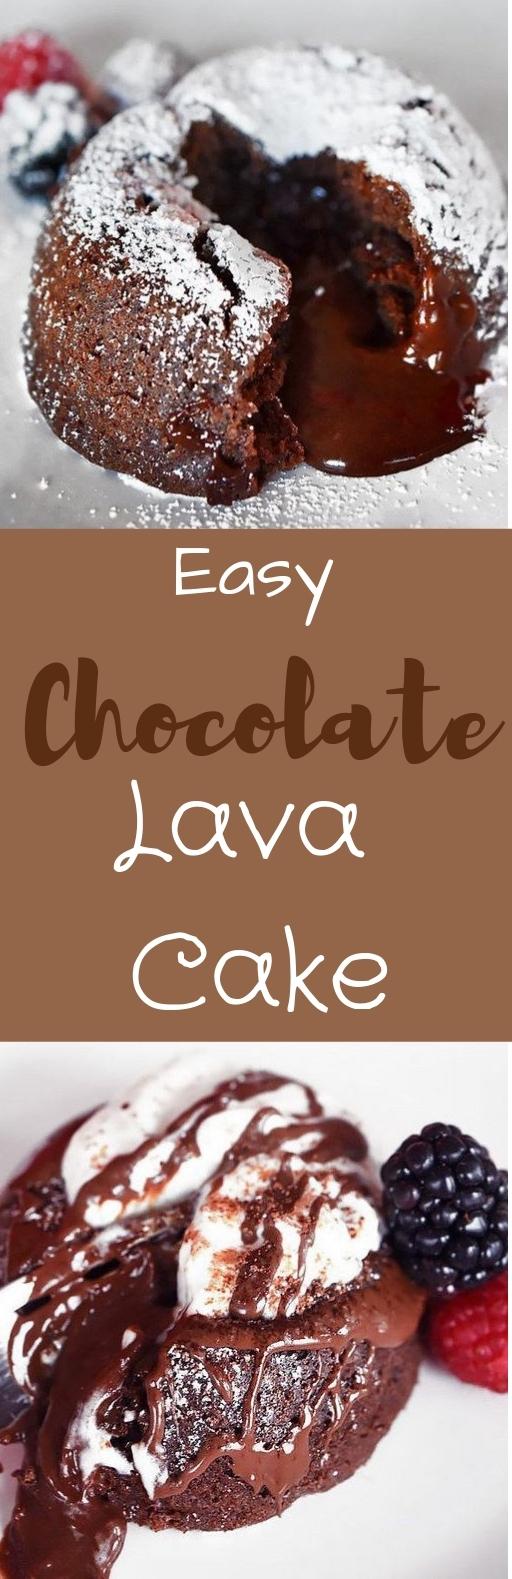 Easy Chocolate Lava Cakes #chocolatecake #dessert